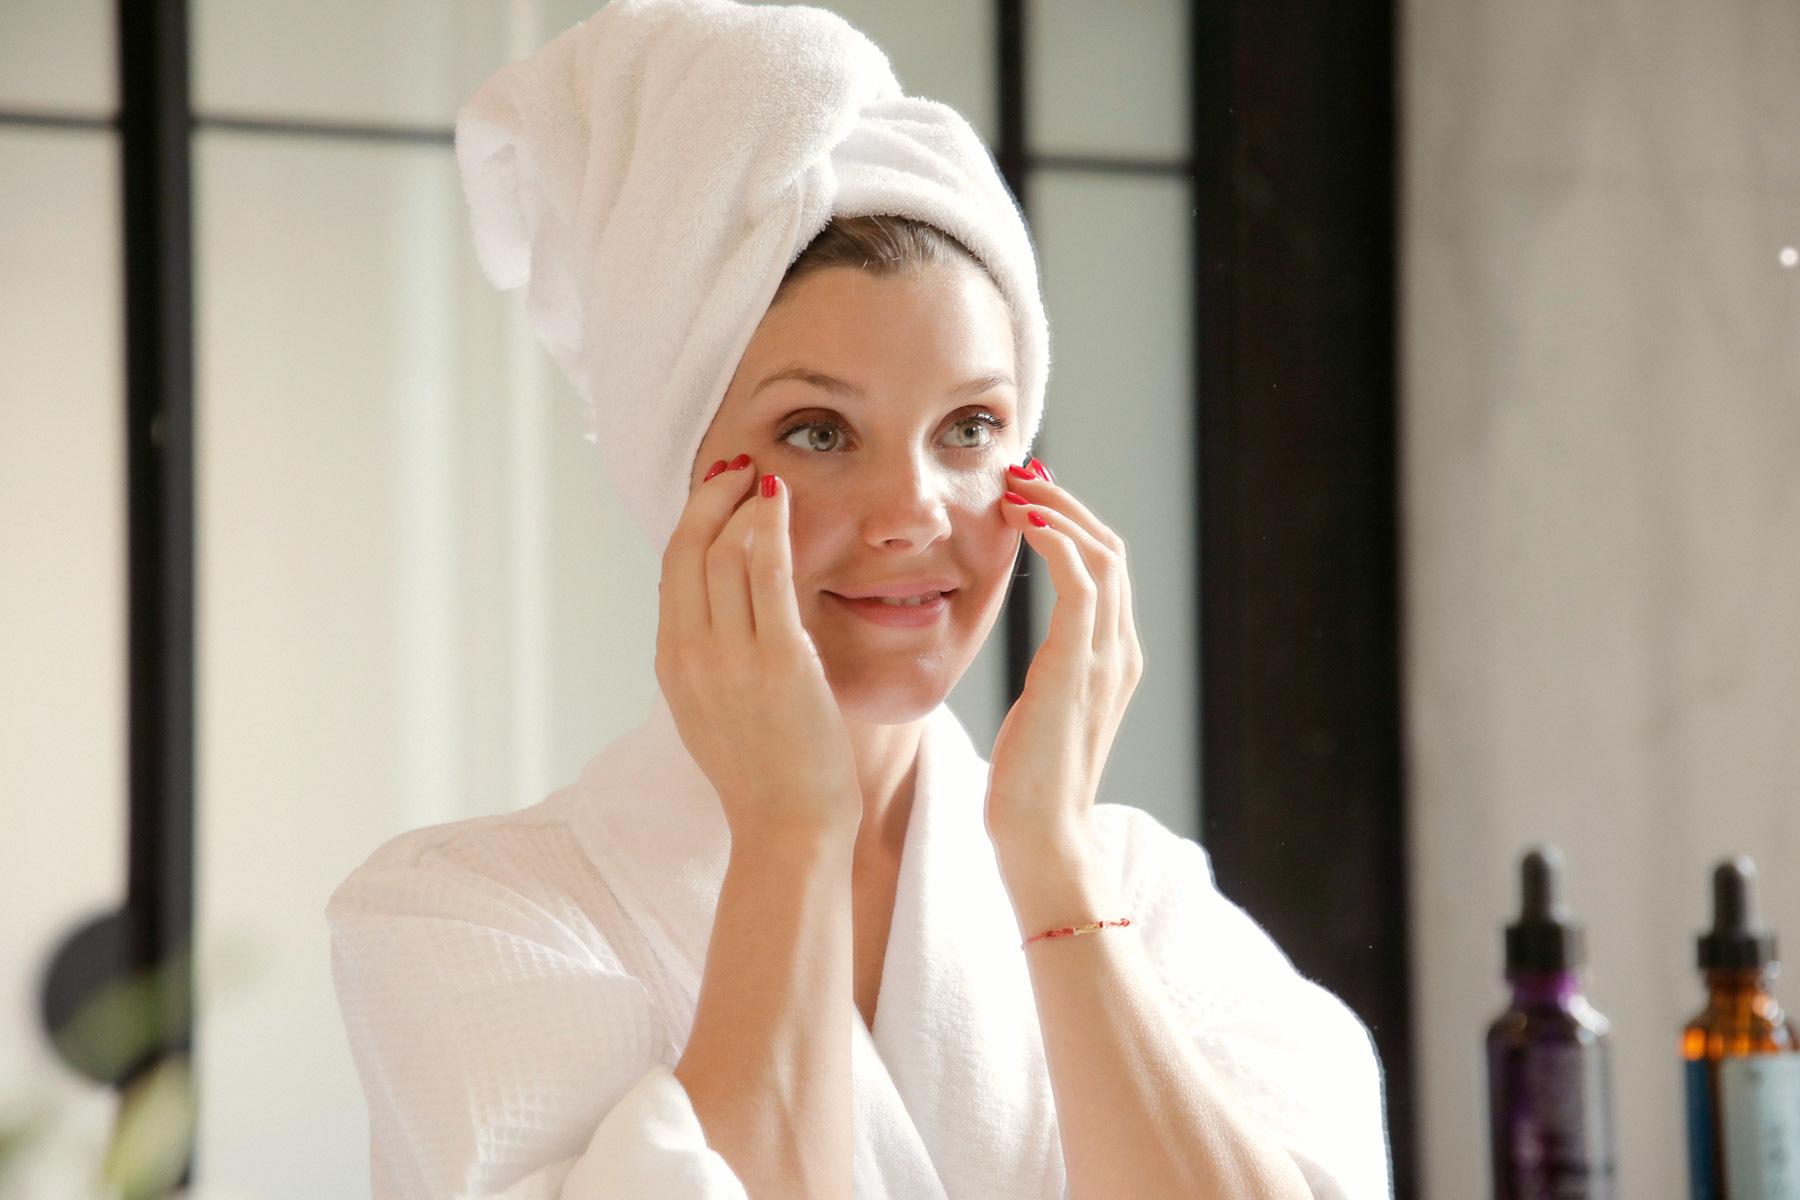 Yael Maquieira durante su ritual de belleza diurno con Skinceuticals.